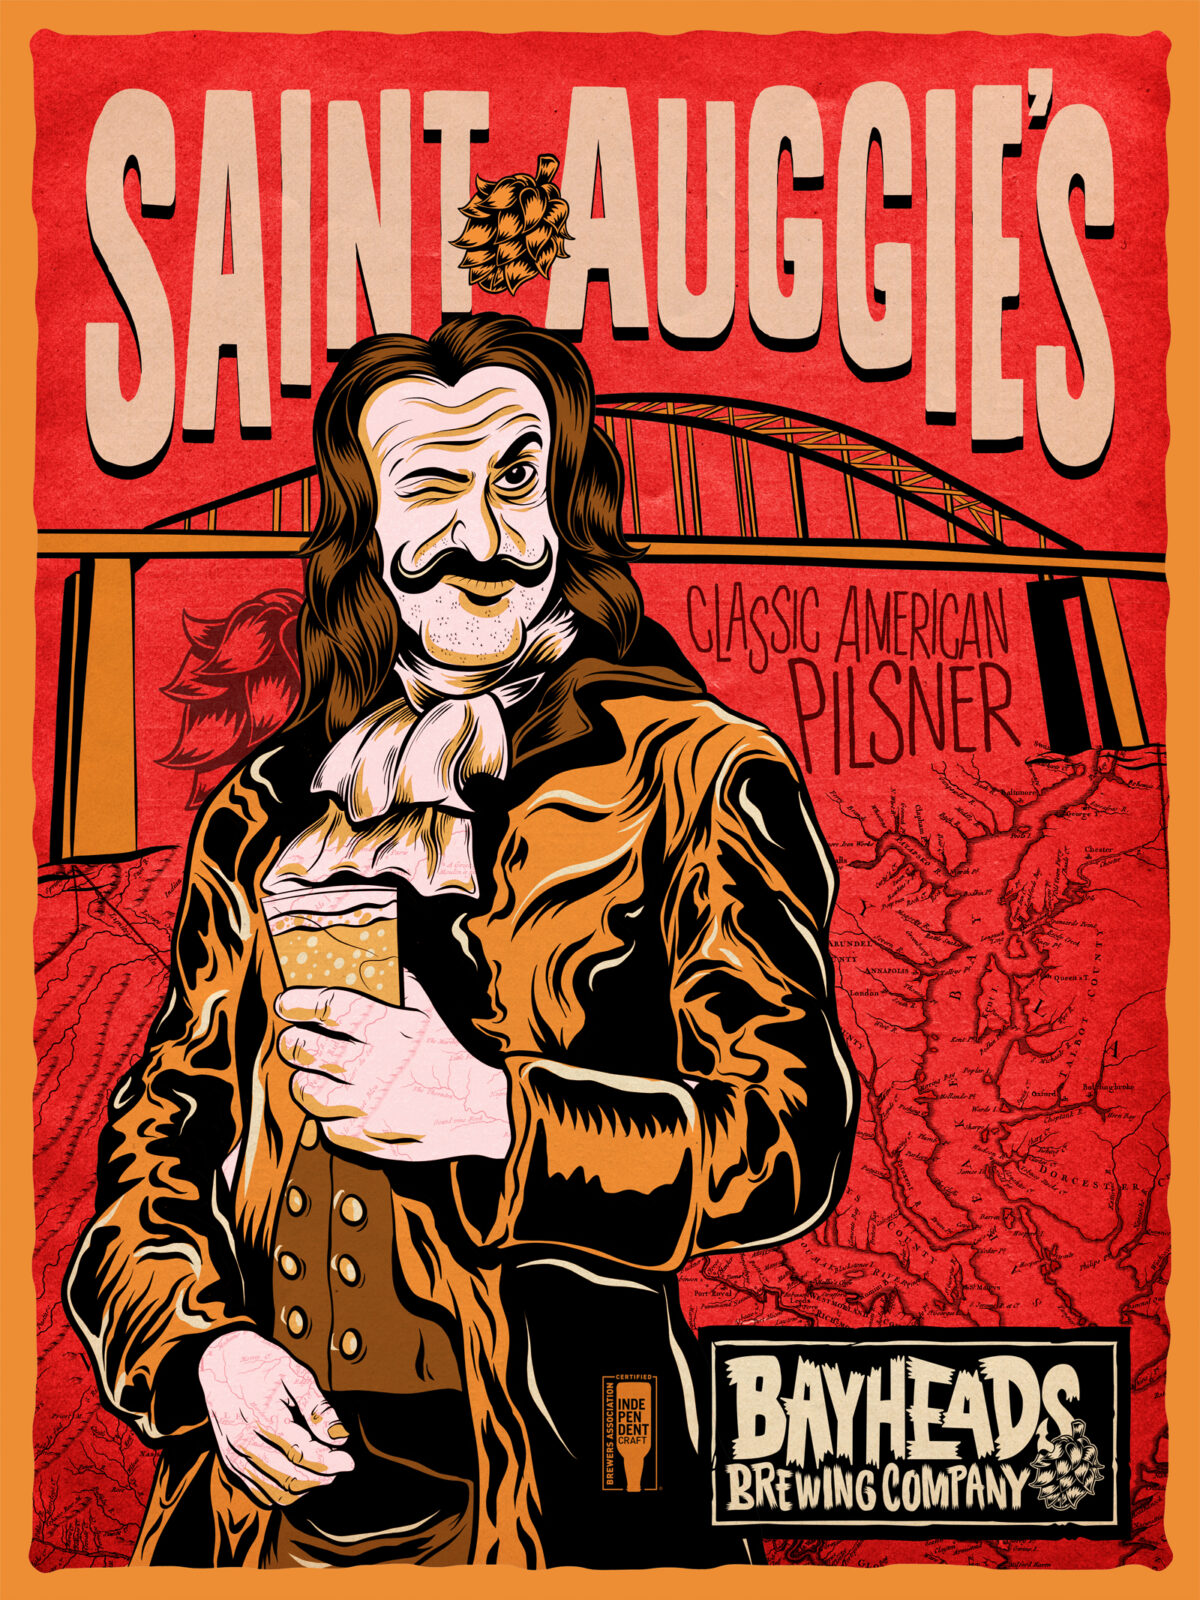 St. Auggie – Bayheads Brewing Company